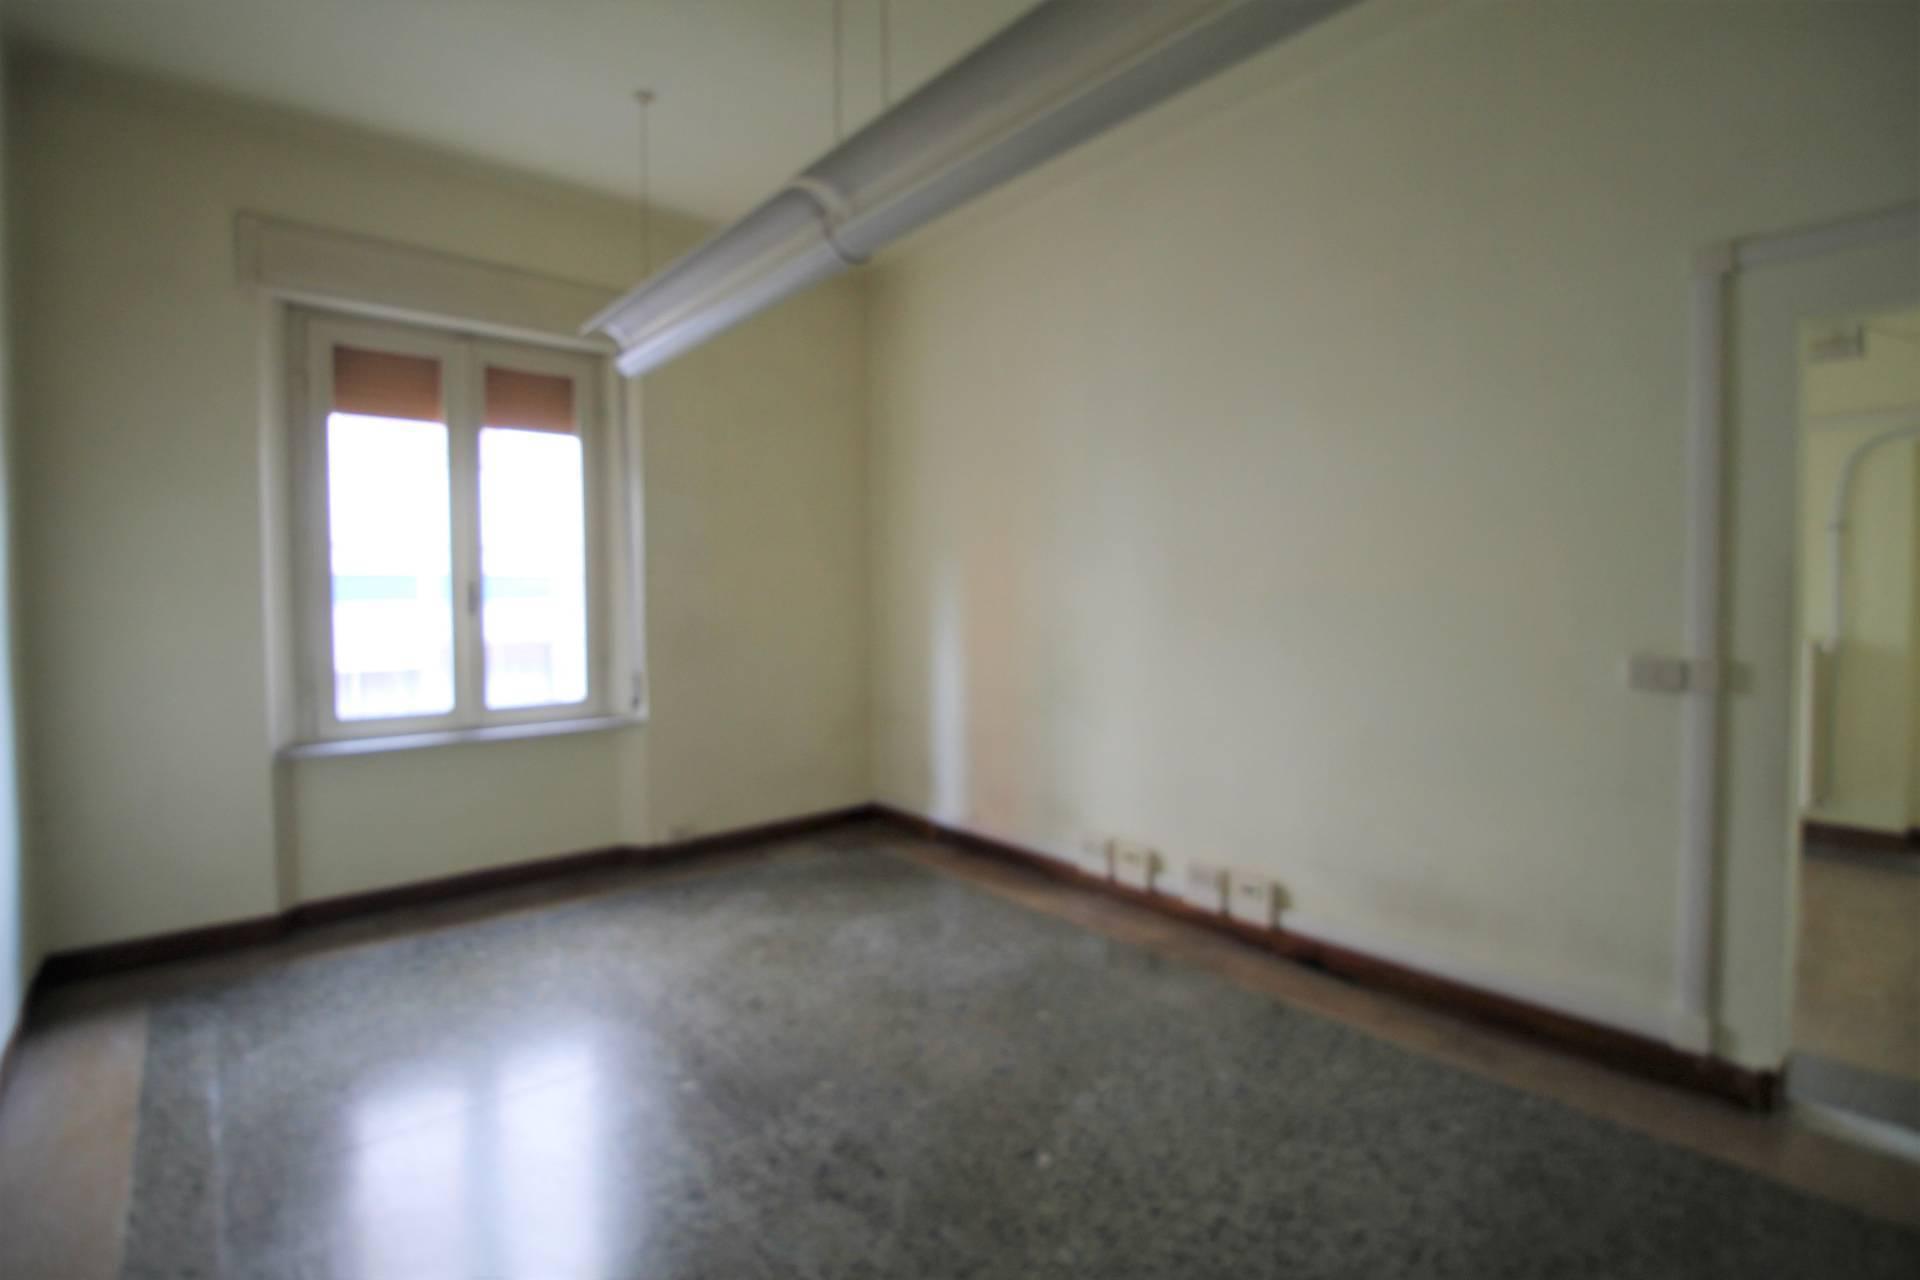 Appartamento in vendita, rif. V2861B